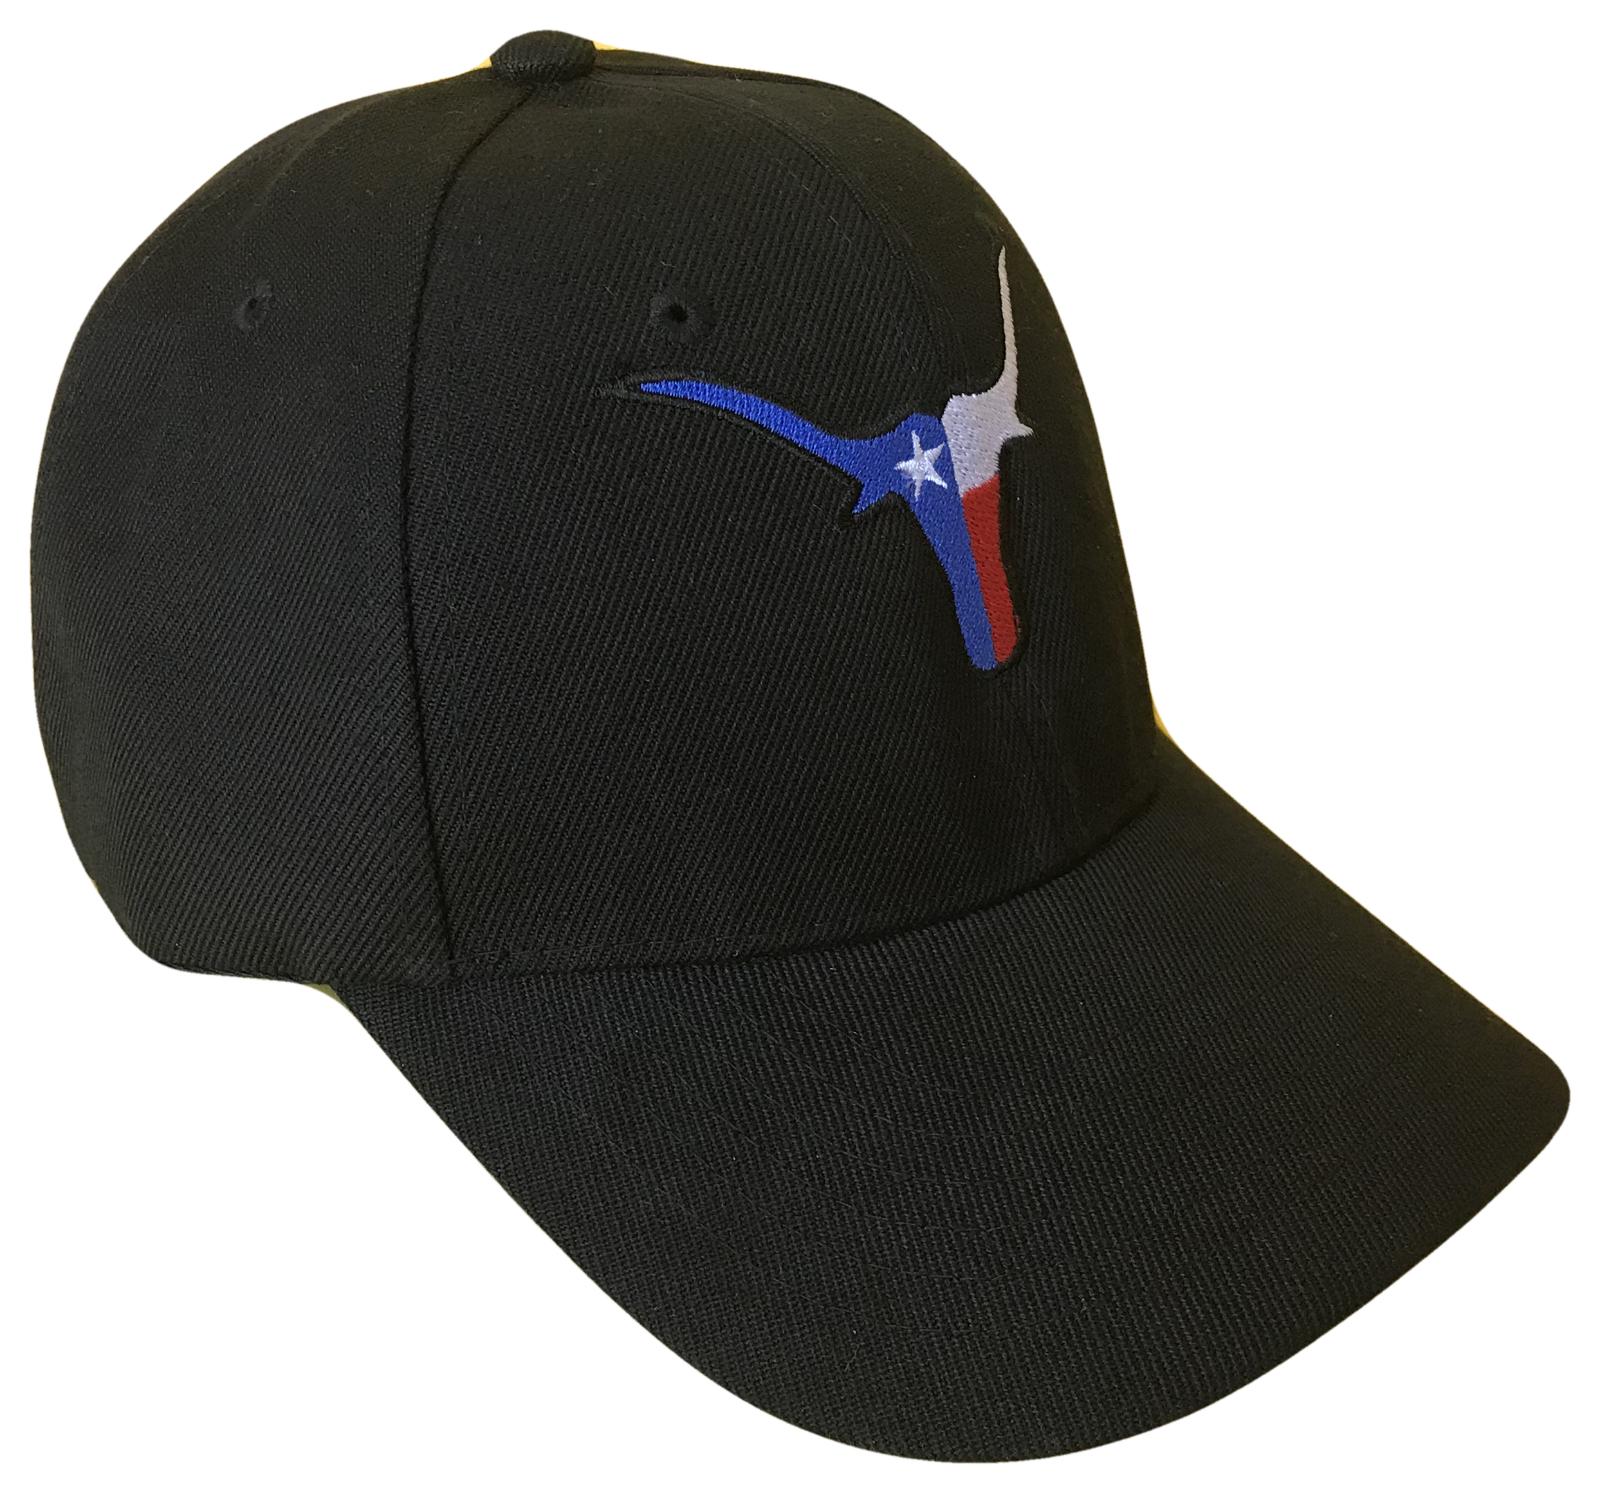 Printed Texas Longhorns State Flag Adjustable Baseball Cap Hat Adjustable